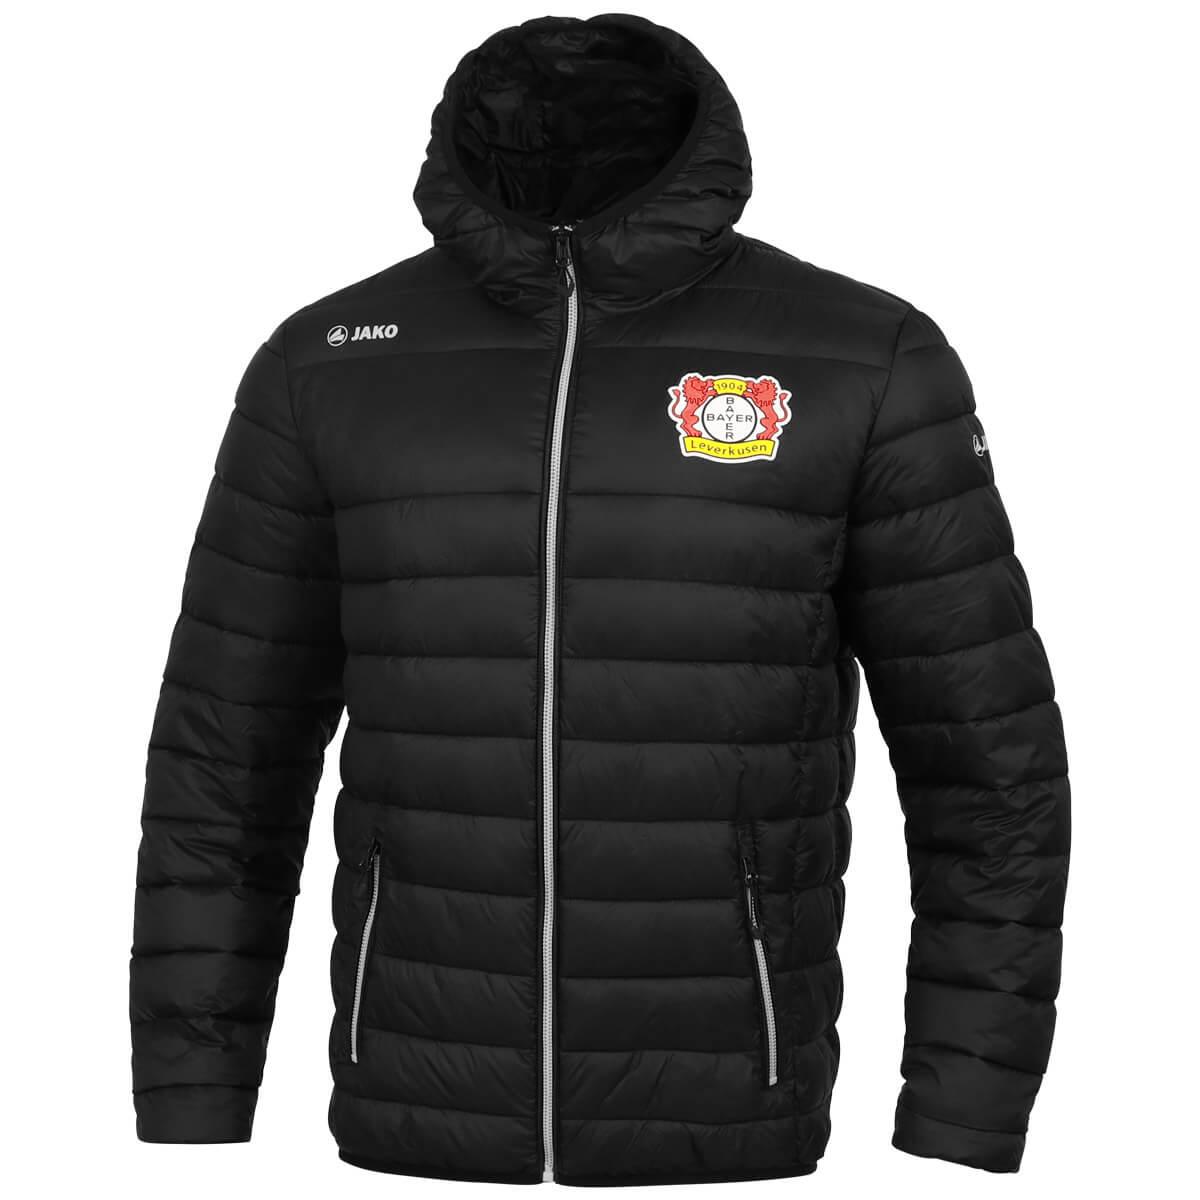 Bayer 04 Leverkusen Steppjacke - Kinder | Jako BA7303